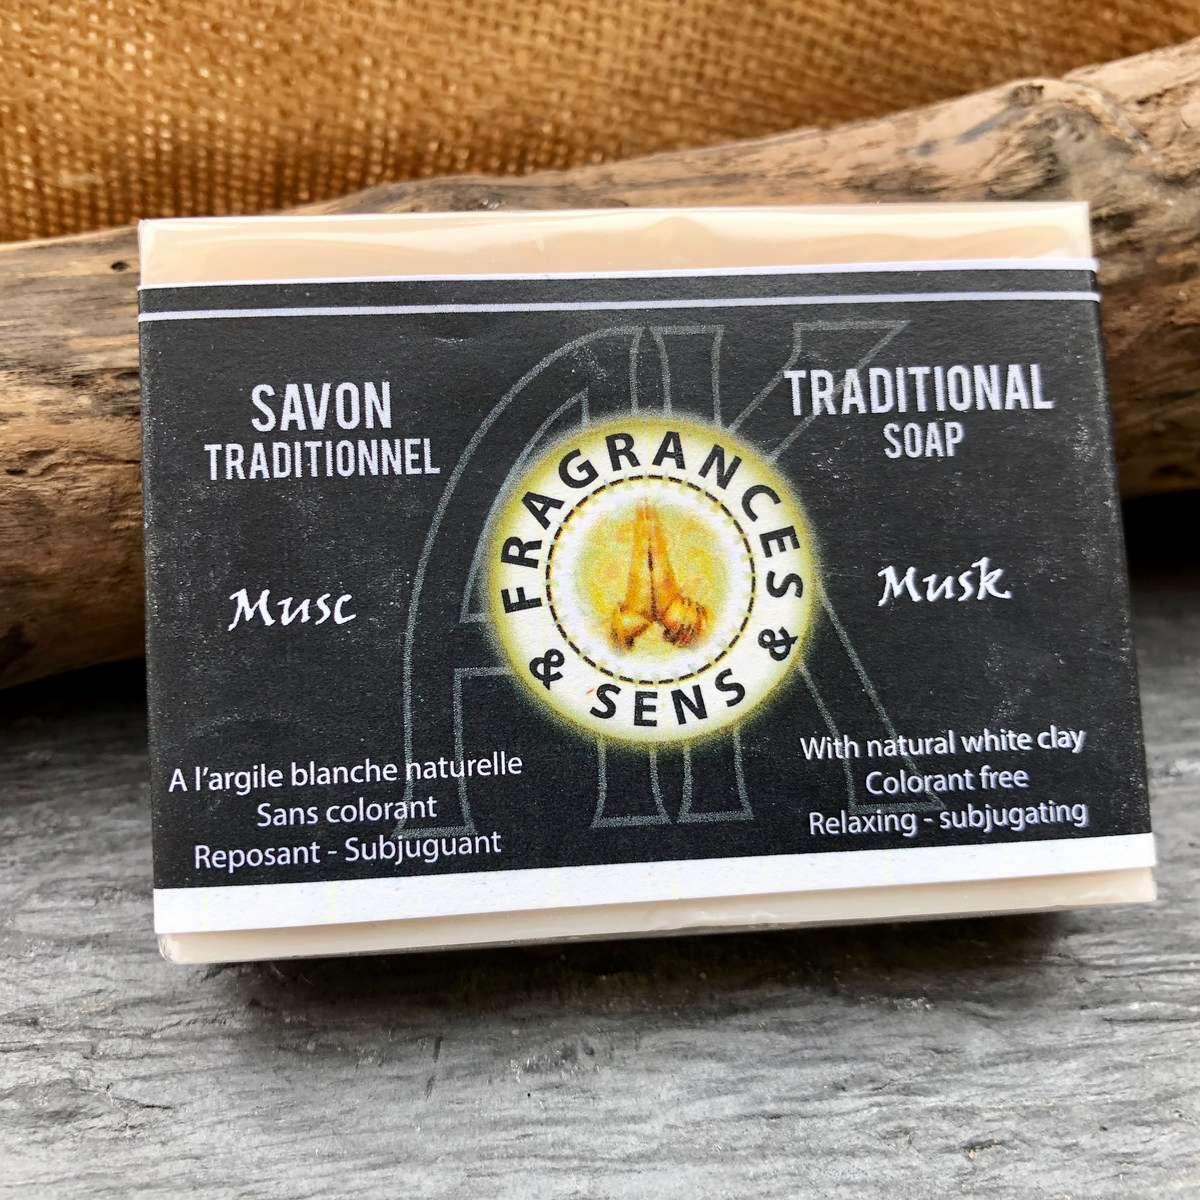 Savon Sans Odeur Pour La Chasse savon traditionnel musc